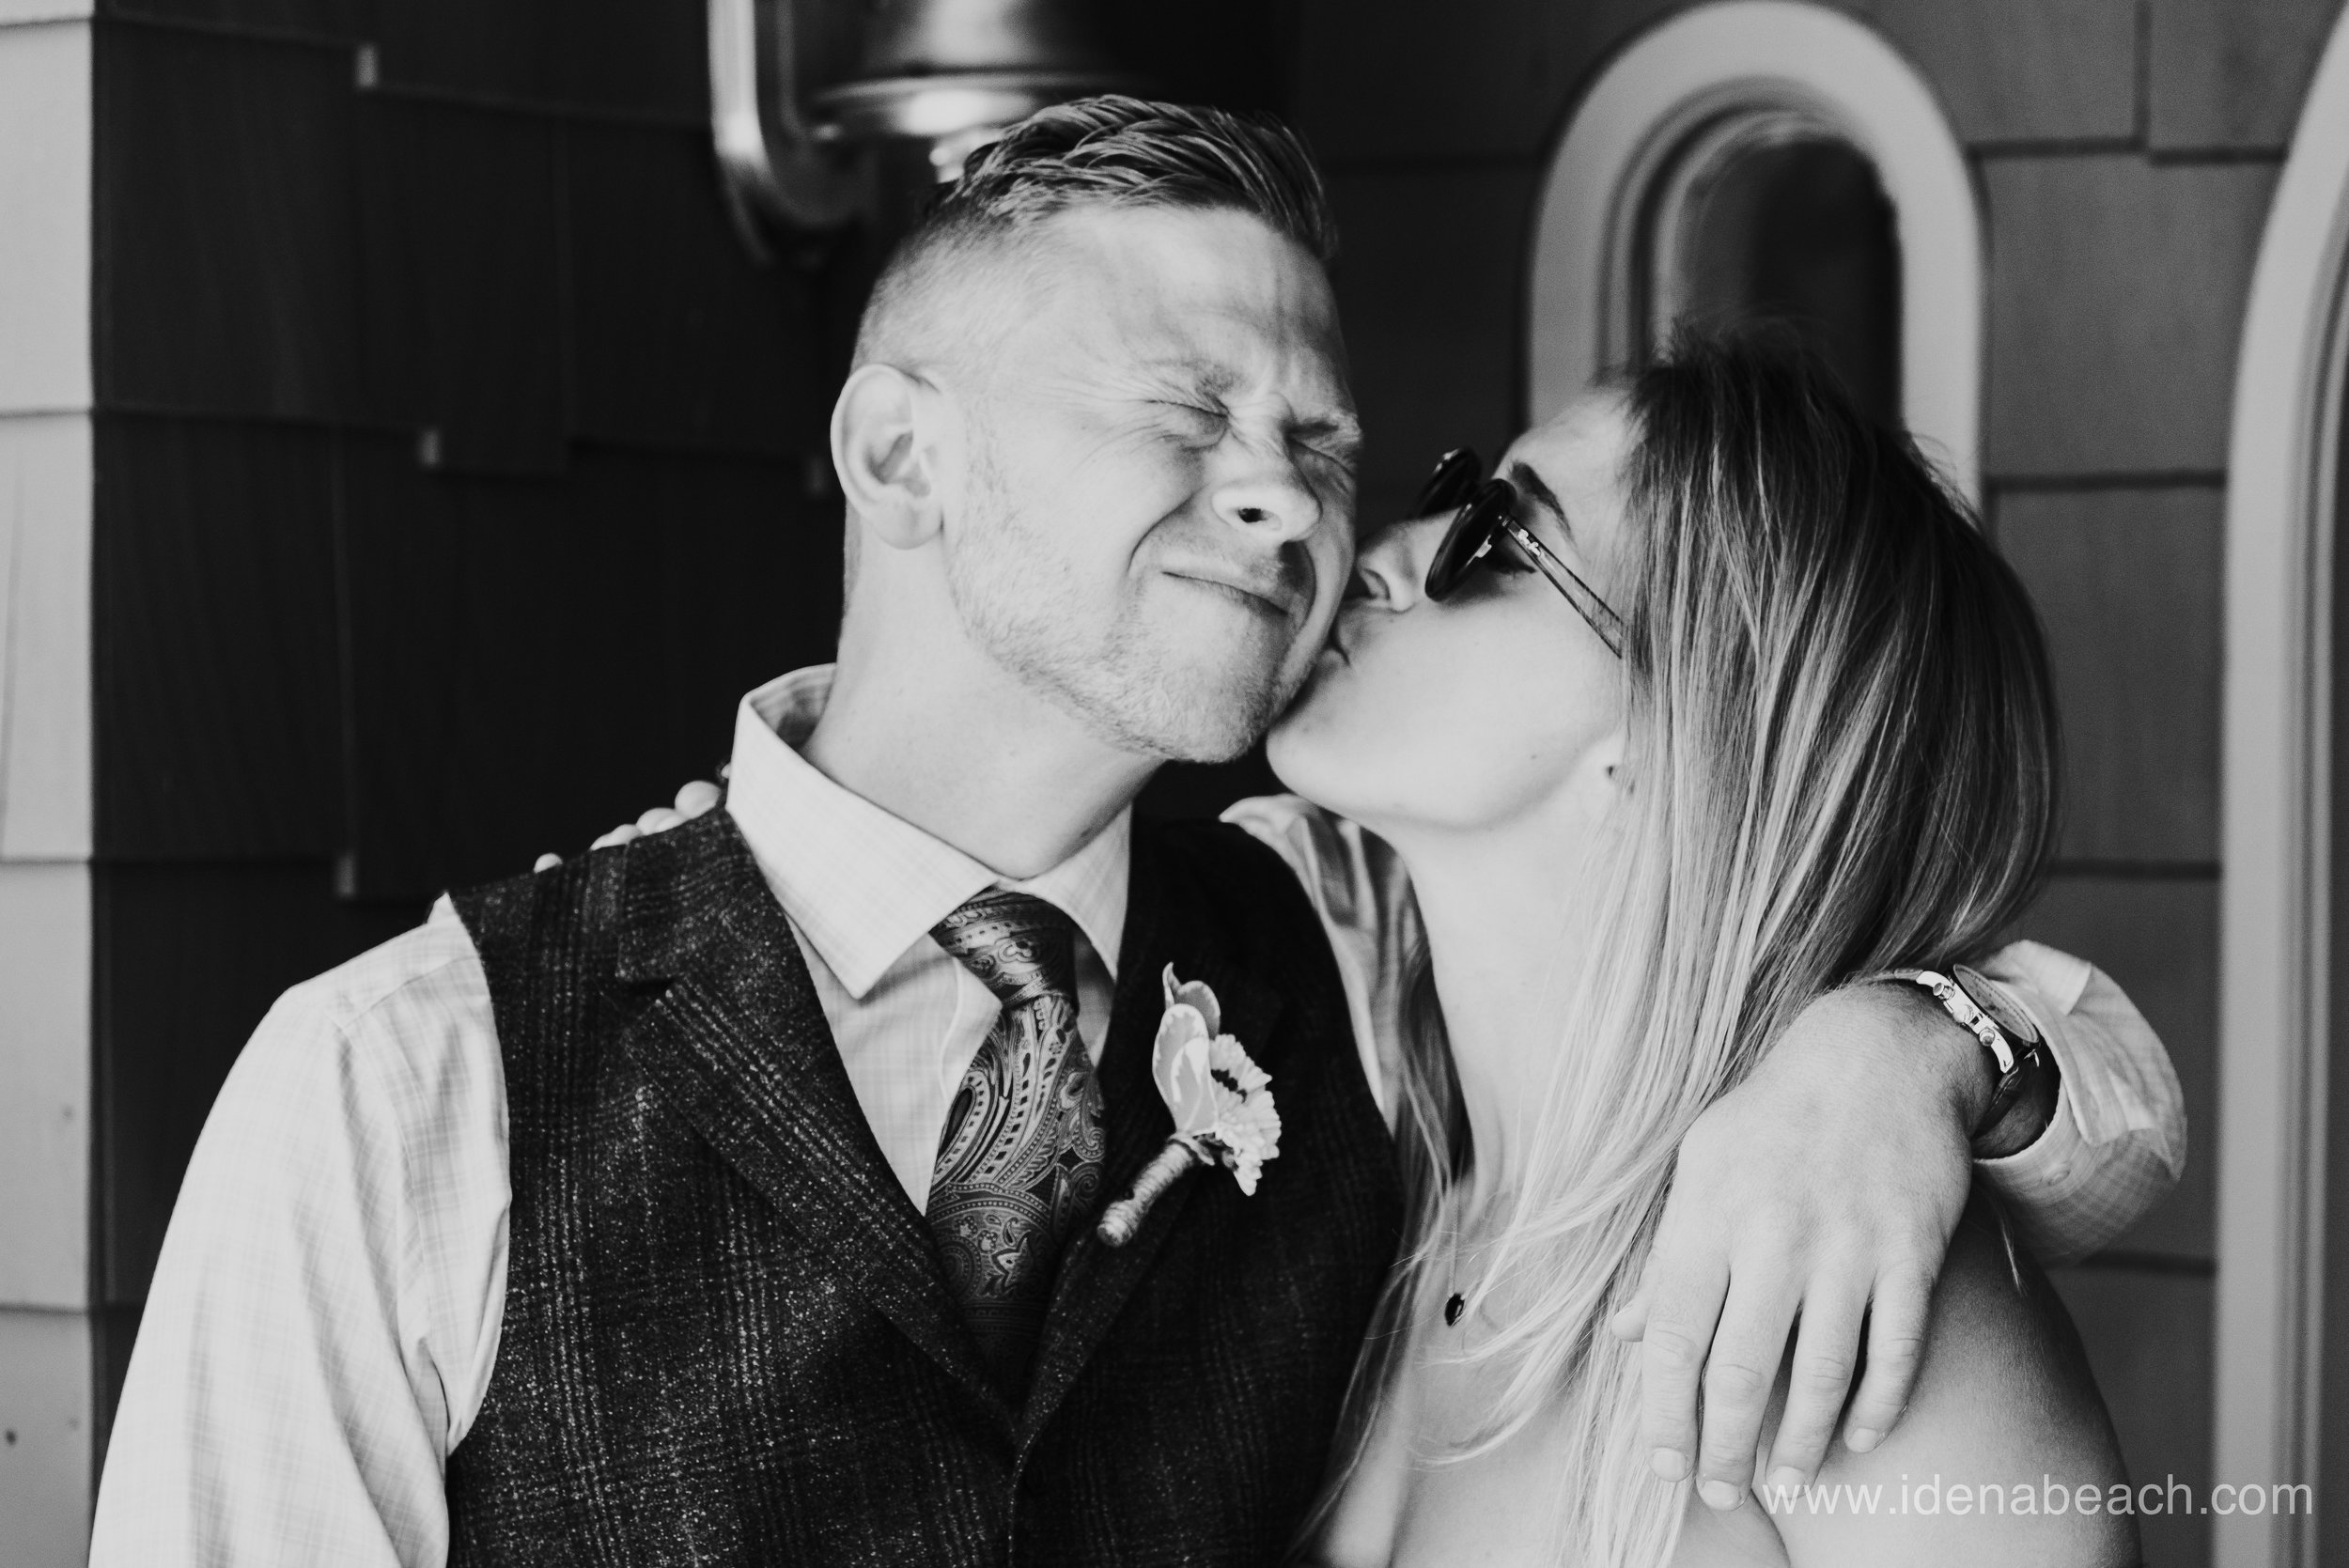 IdenaBeach-Vermont-Wedding-Photographer-Mountain-Top-Inn-16.jpg